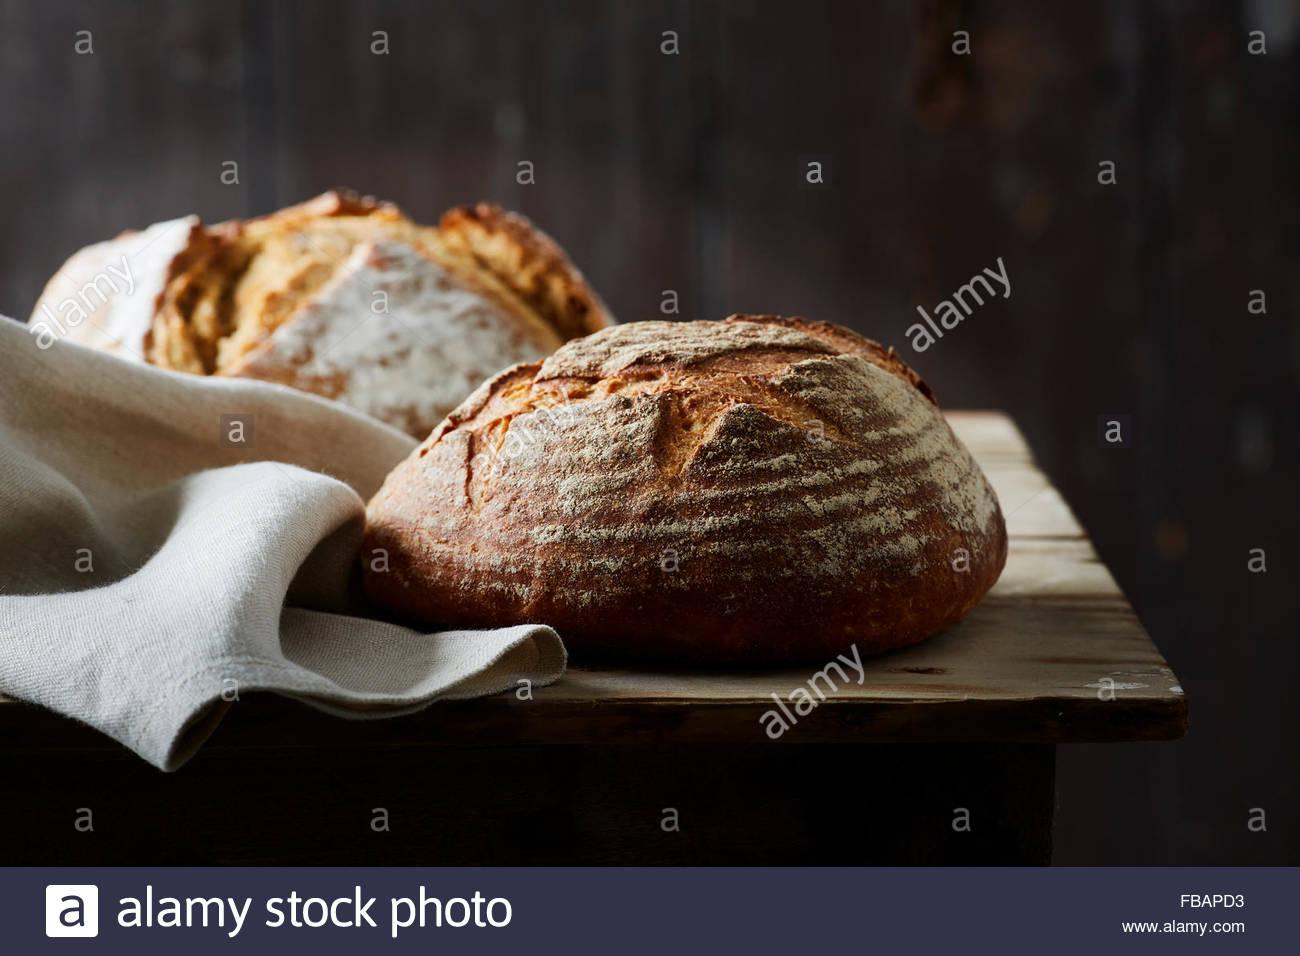 artisan baked bread on dark background - Stock Image